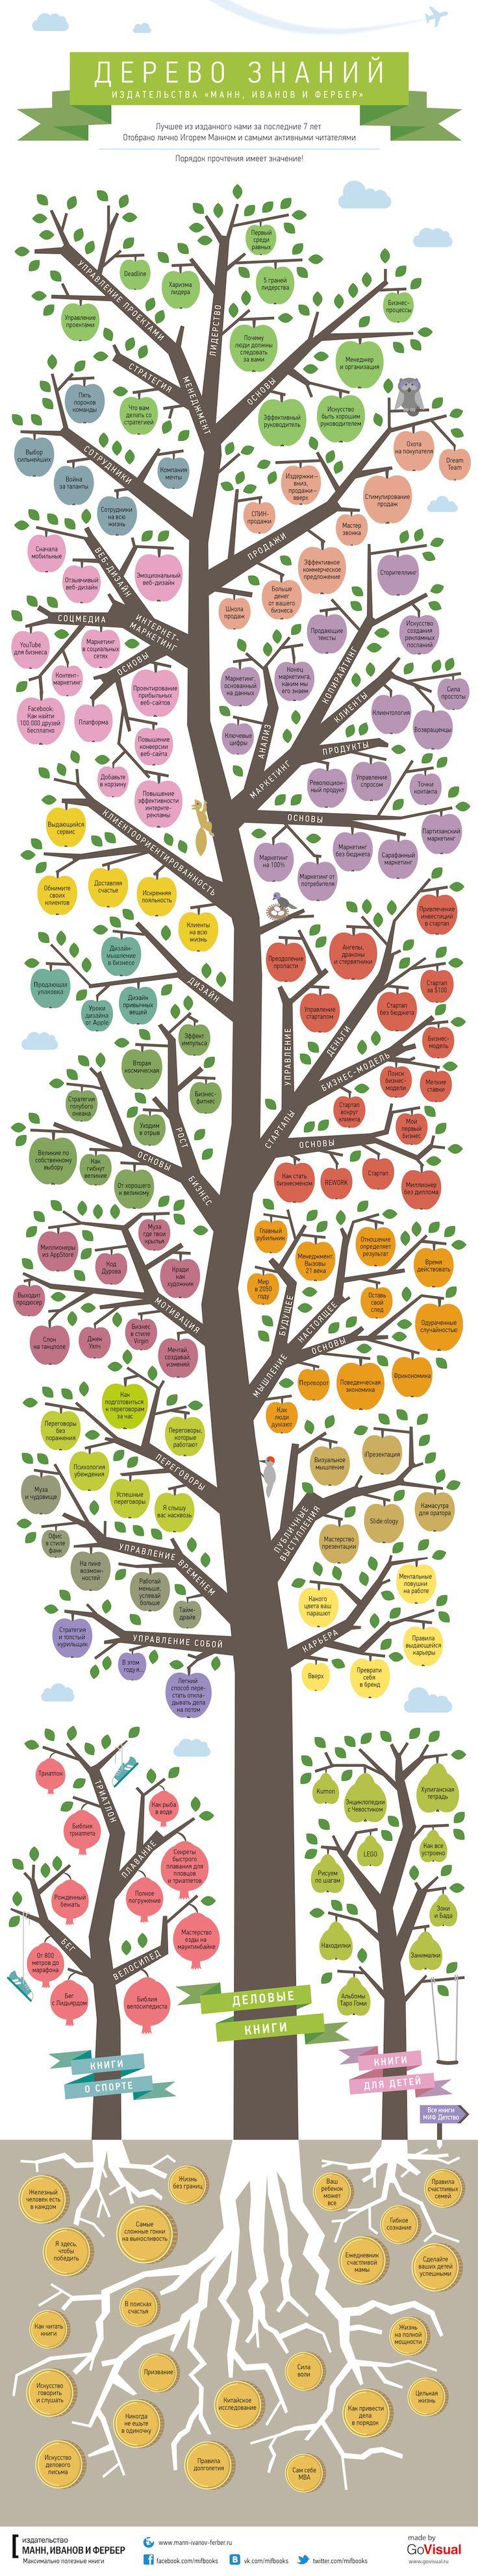 TOUCH это изображение: Дерево знаний 2 by mfirsanov